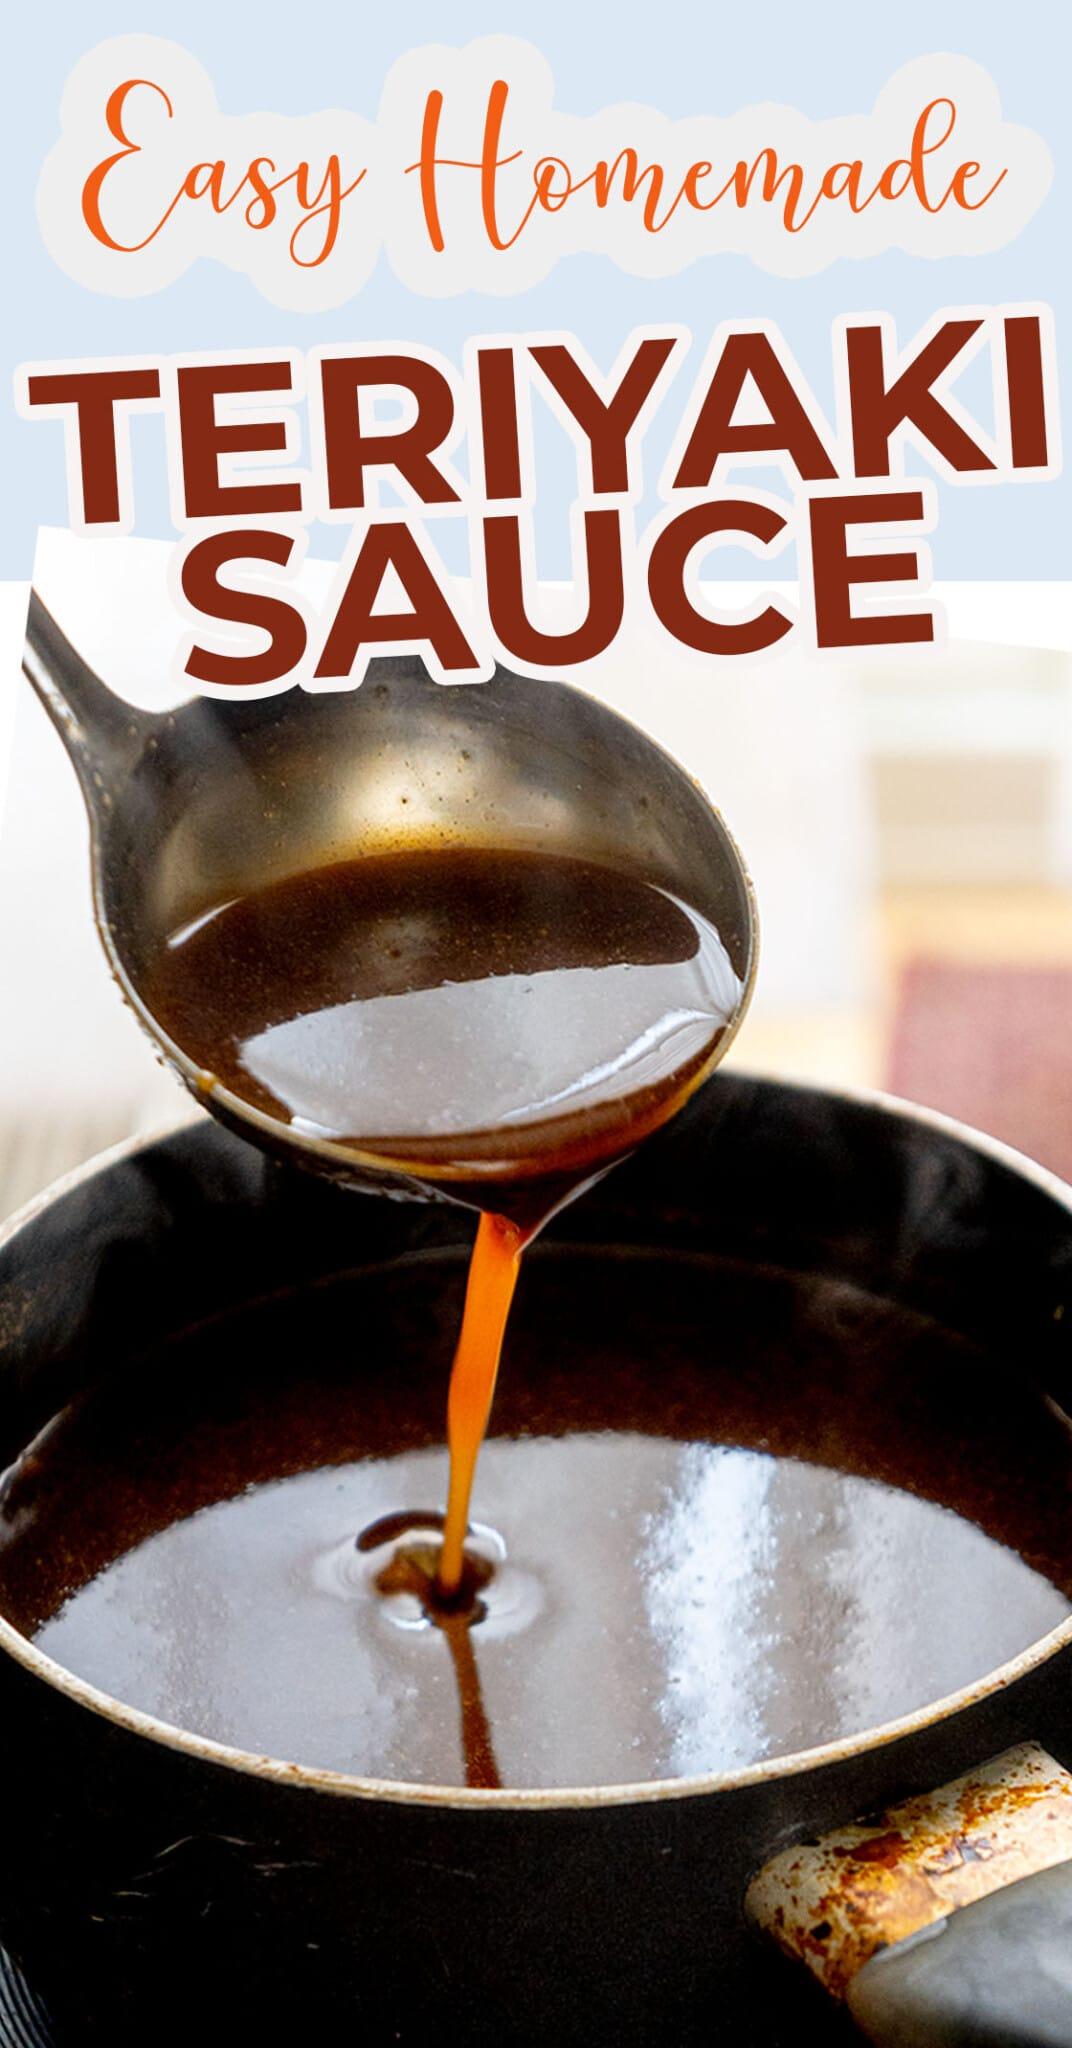 Easy Teriyaki Sauce Recipe Homemade